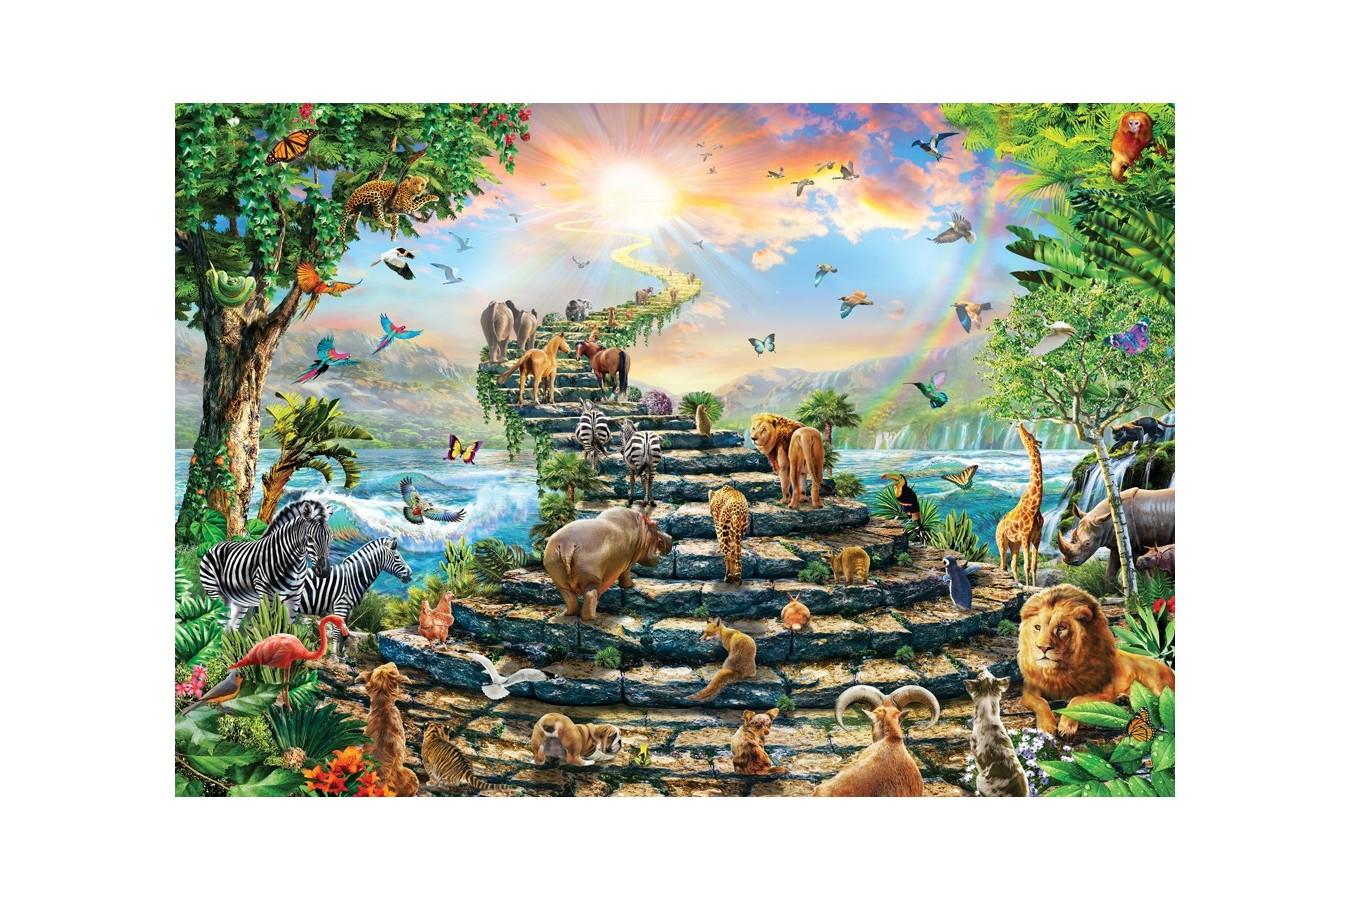 Puzzle Anatolian - Adrian Chesterman: Stairway To Heaven, 260 piese (ANA.3323)